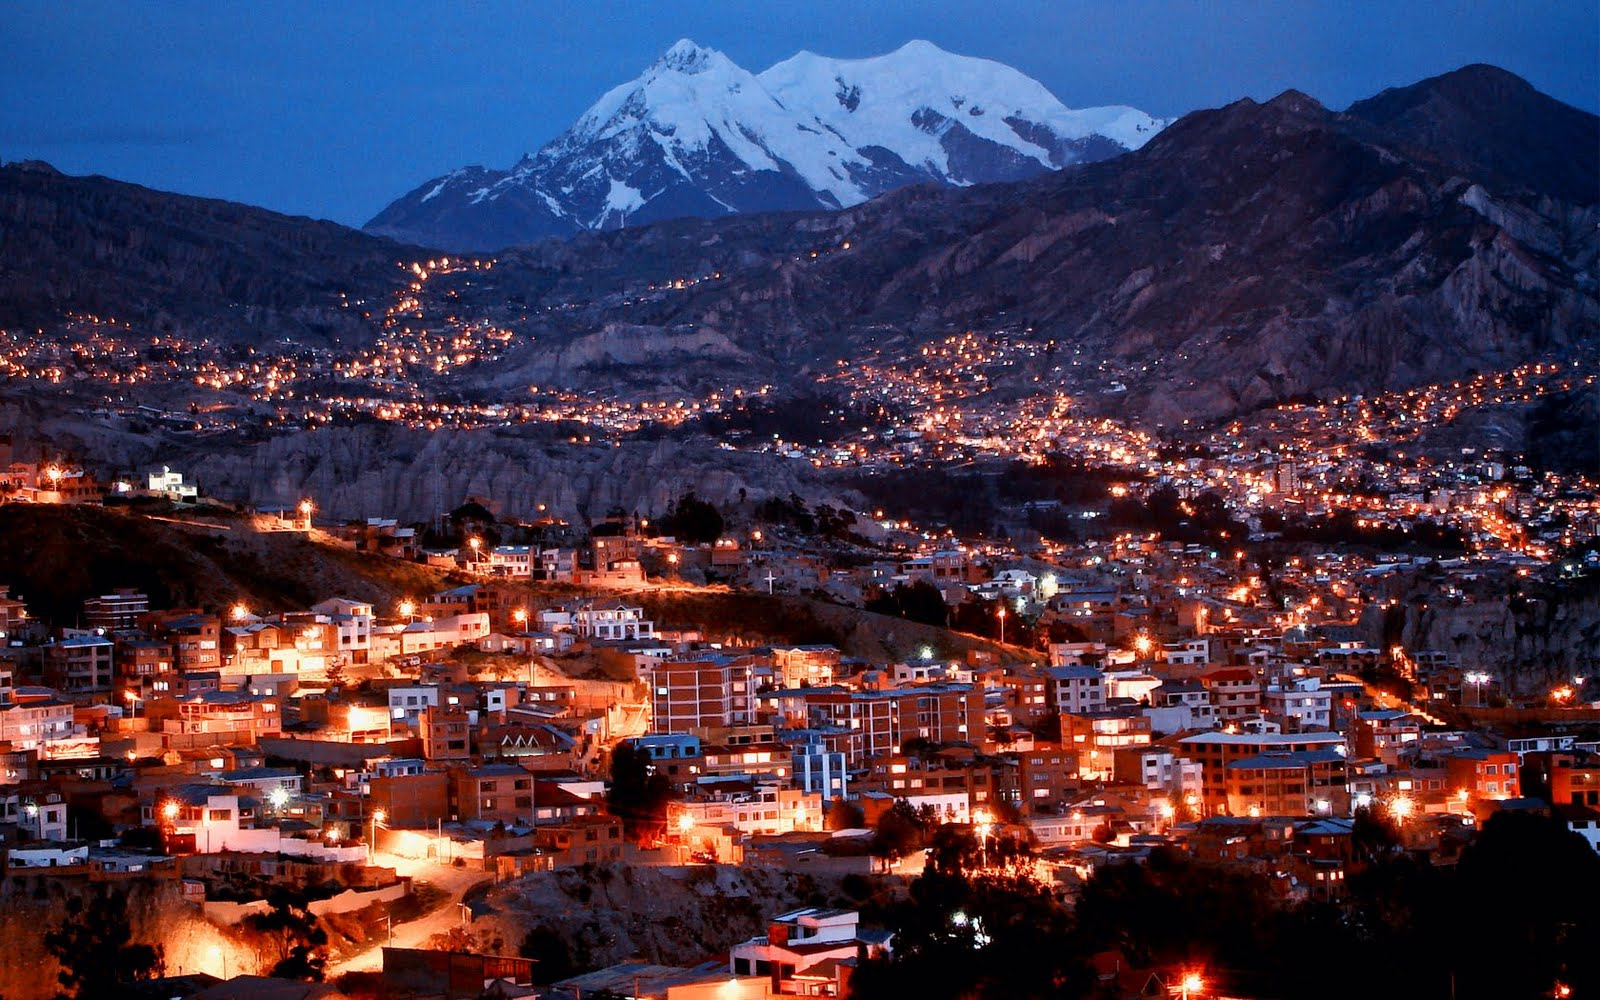 http://2.bp.blogspot.com/-b_bp_dspdfY/TcRNUzAIzpI/AAAAAAAADc0/aGKy3AtWuGo/s1600/la_paz_bolivia.jpg